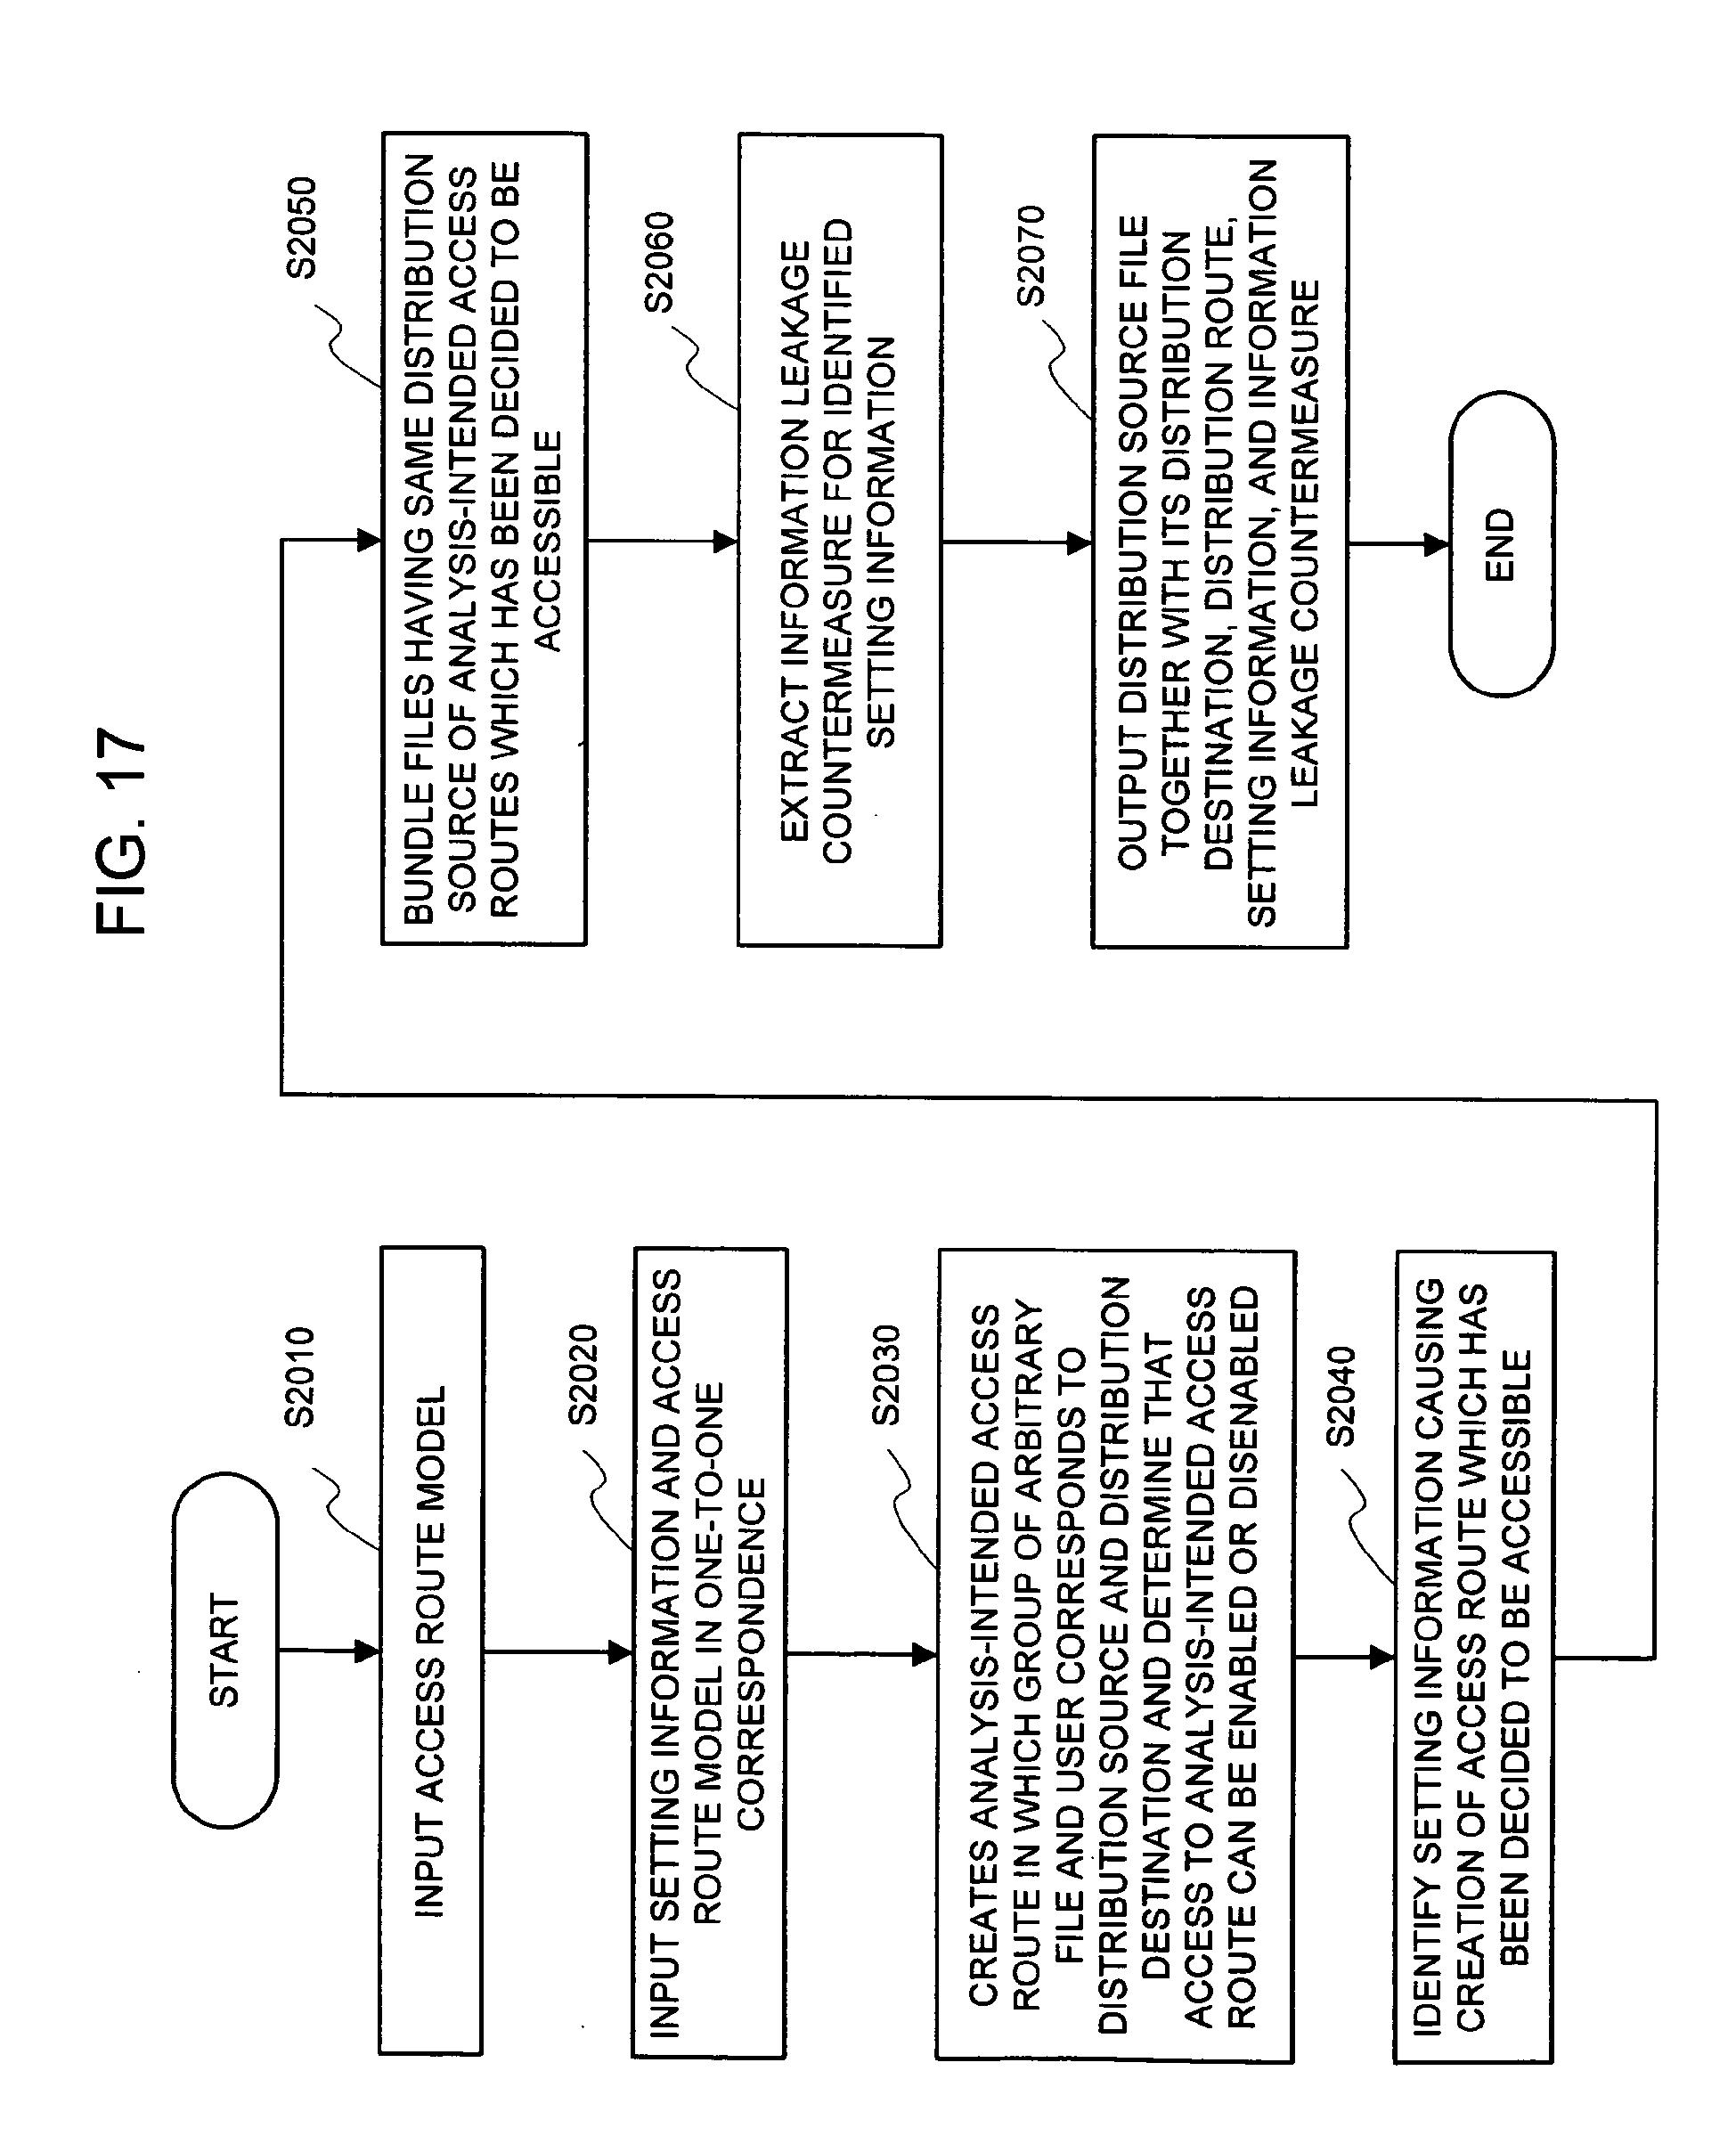 information leak analysis system